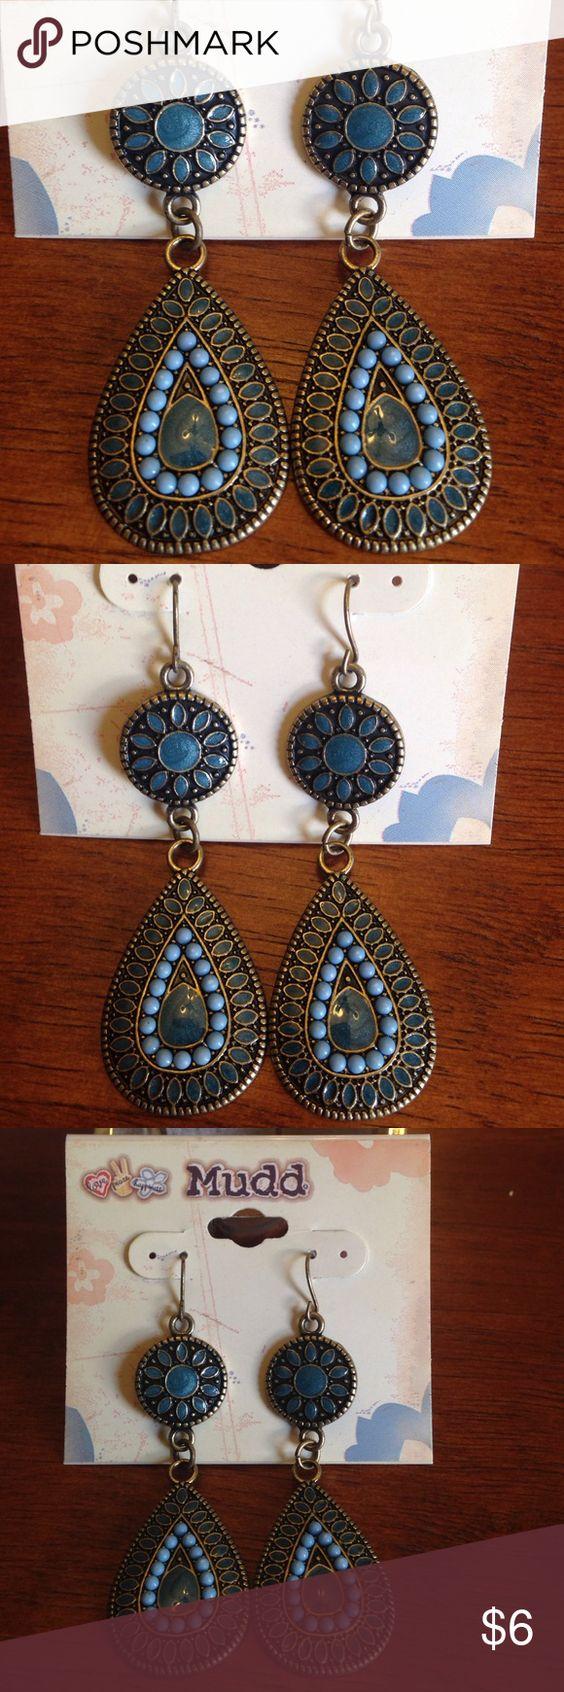 Beautiful boho earrings New with tags. Mudd Jewelry Earrings